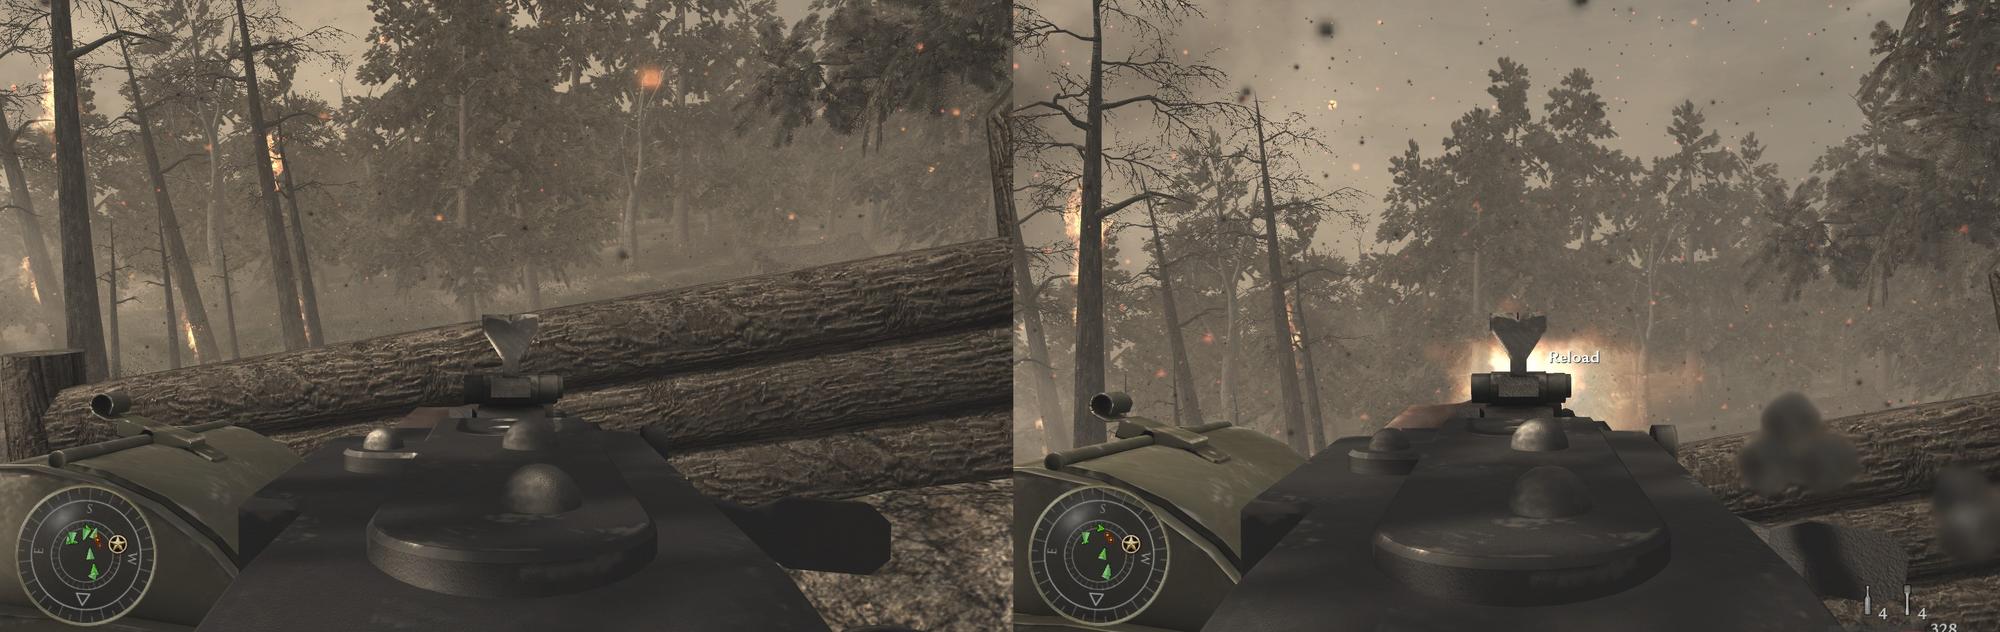 Recoil | Call of Duty Wiki | FANDOM powered by Wikia